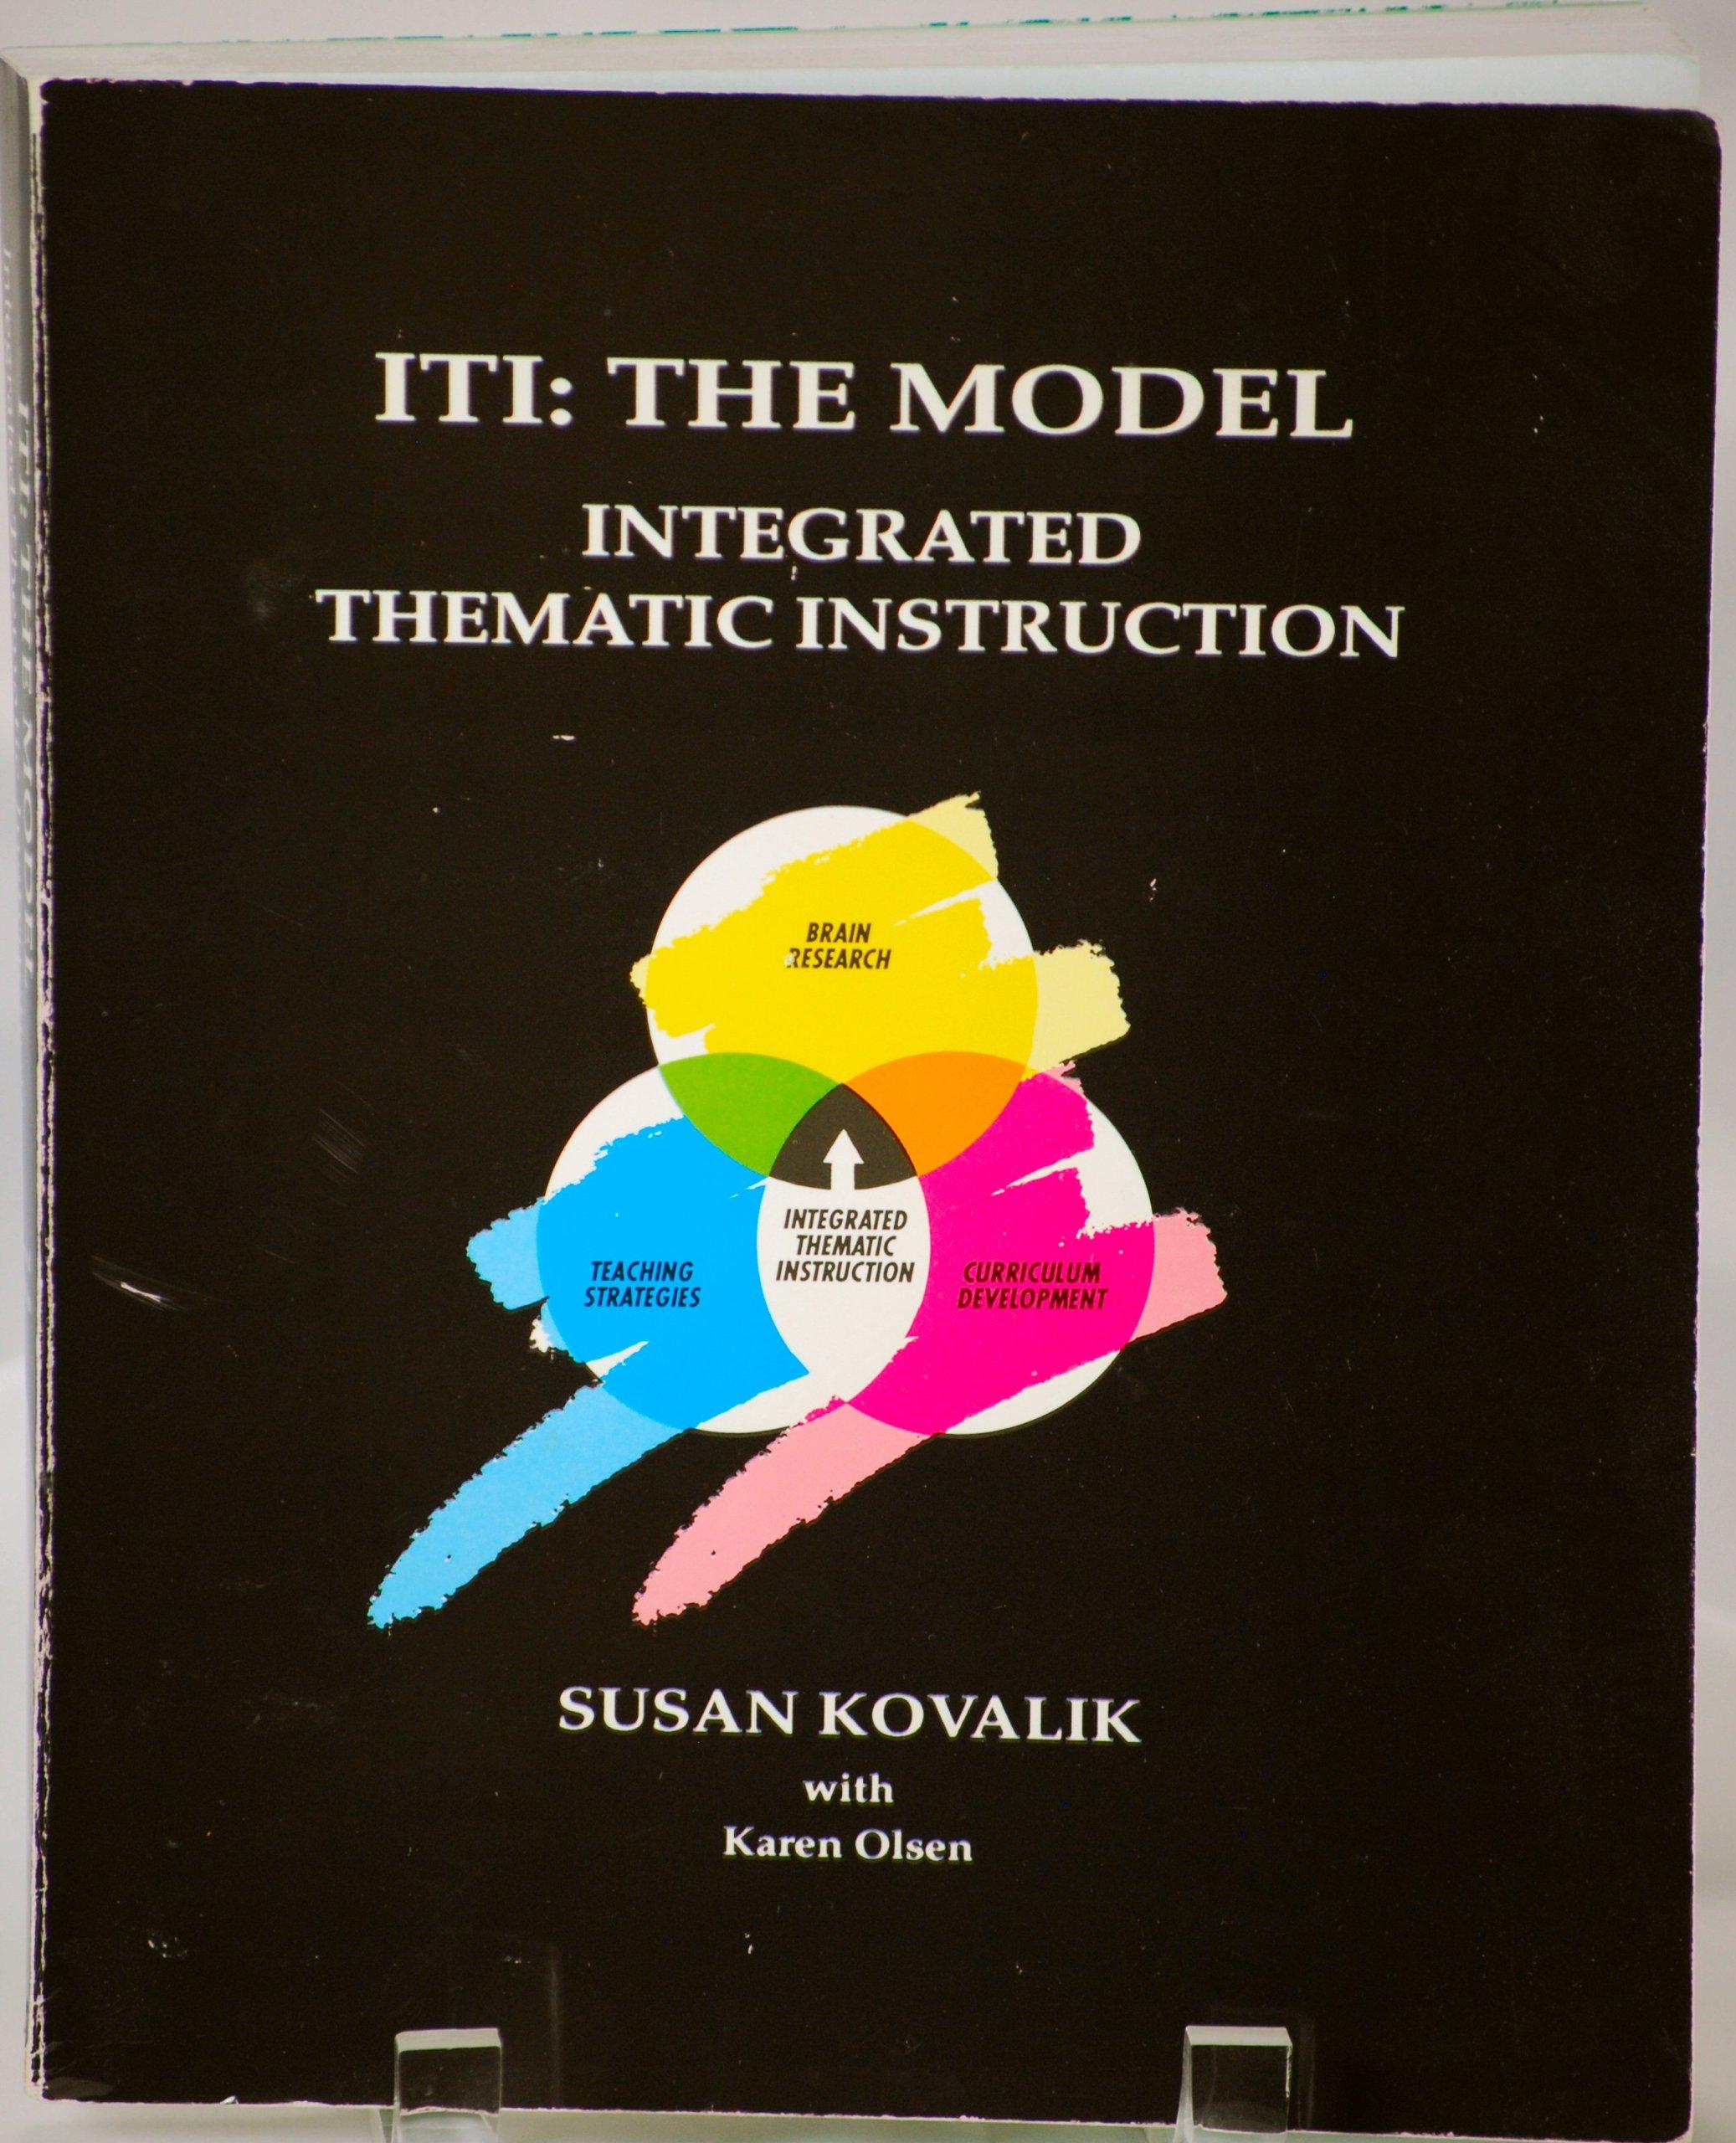 Iti The Model Integrated Thematic Instruction Susan Kovalik